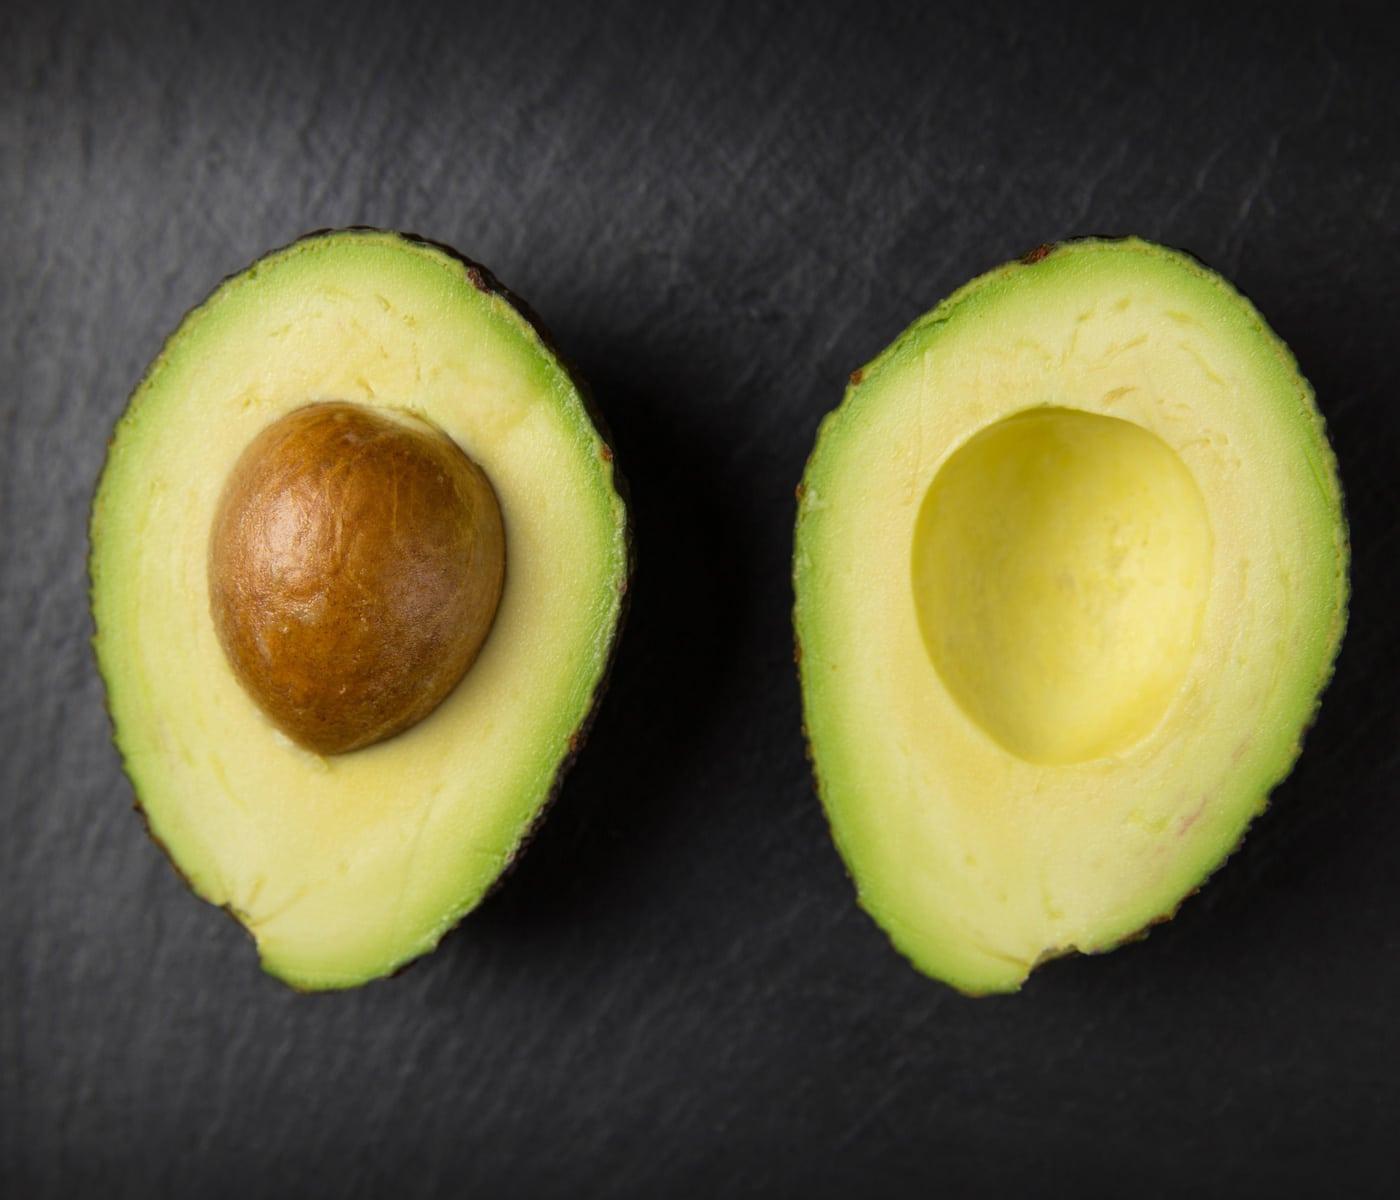 Rezept für Himbeere-Avocado-Smoothie-Bowl: Avocado // HIMBEER